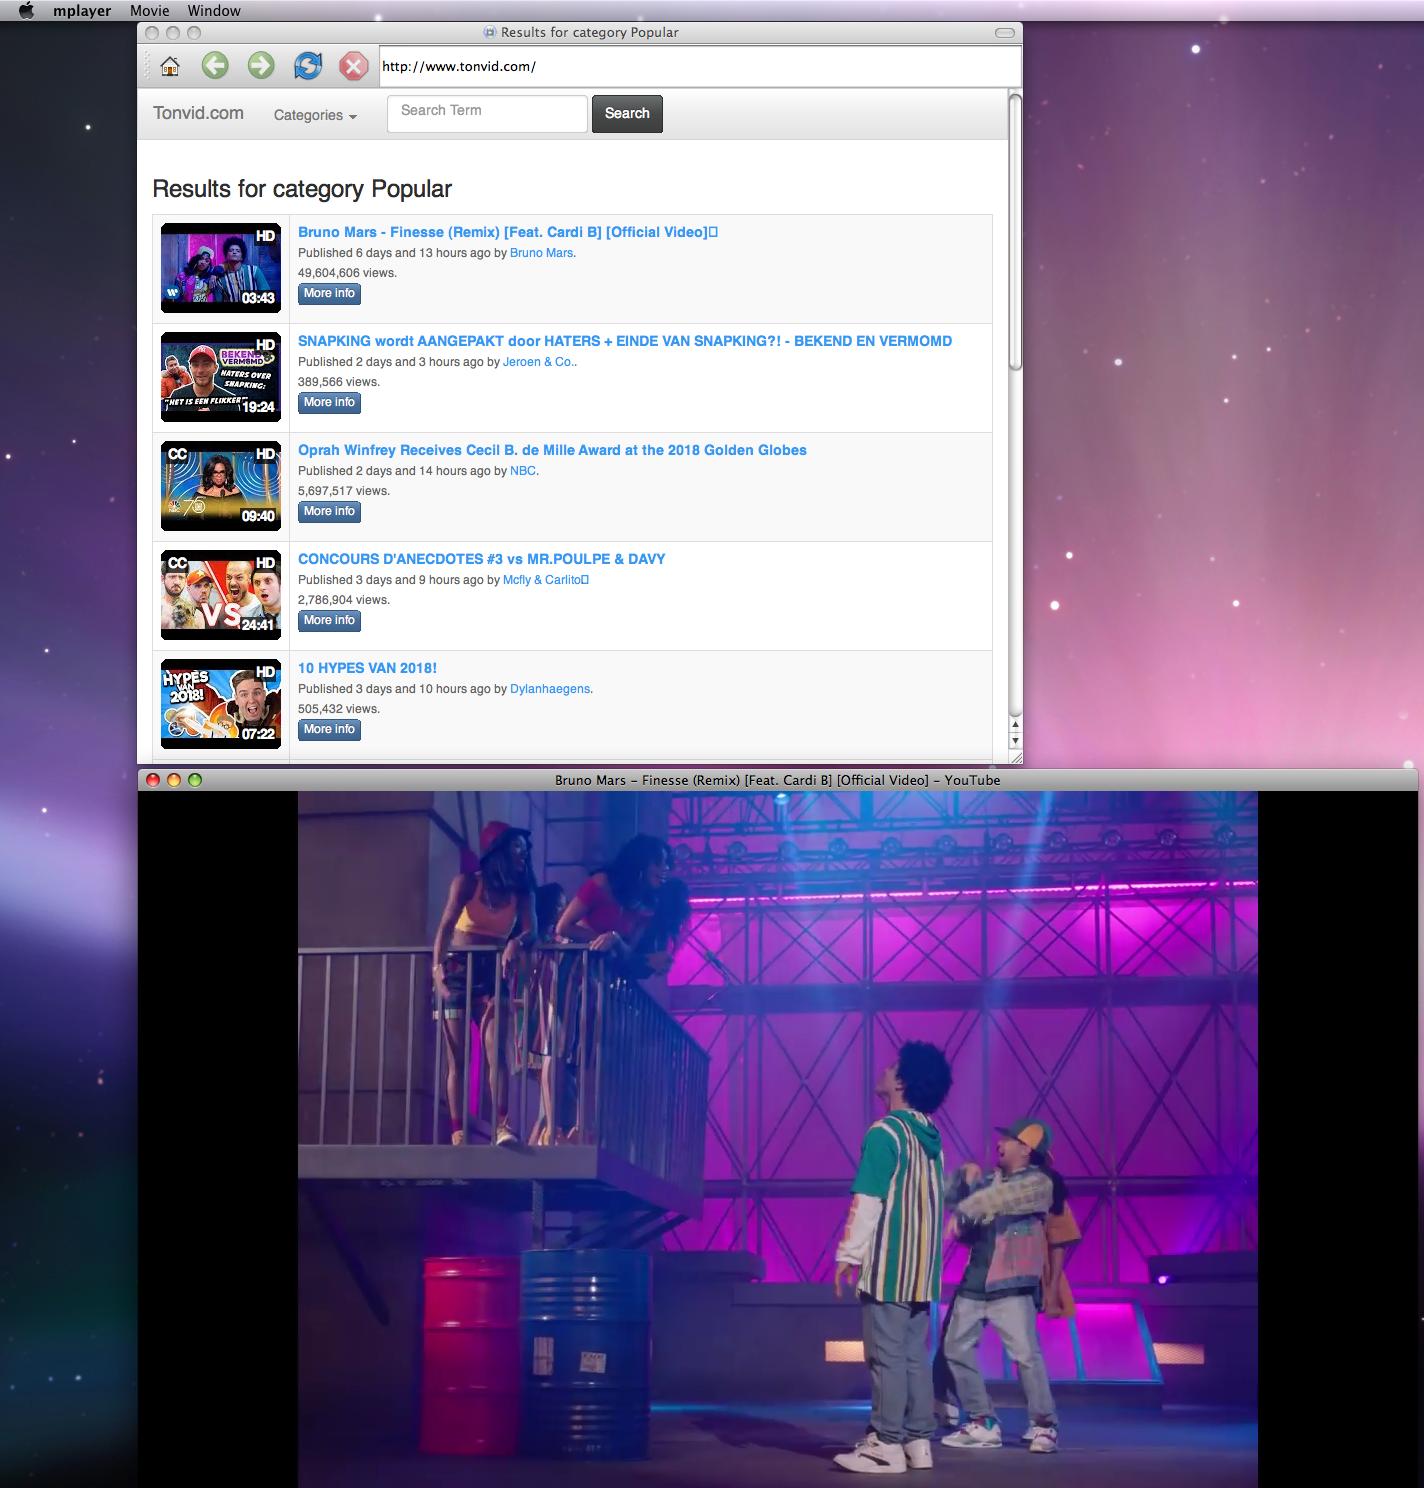 SMTube 18.1 mplayer OK.png